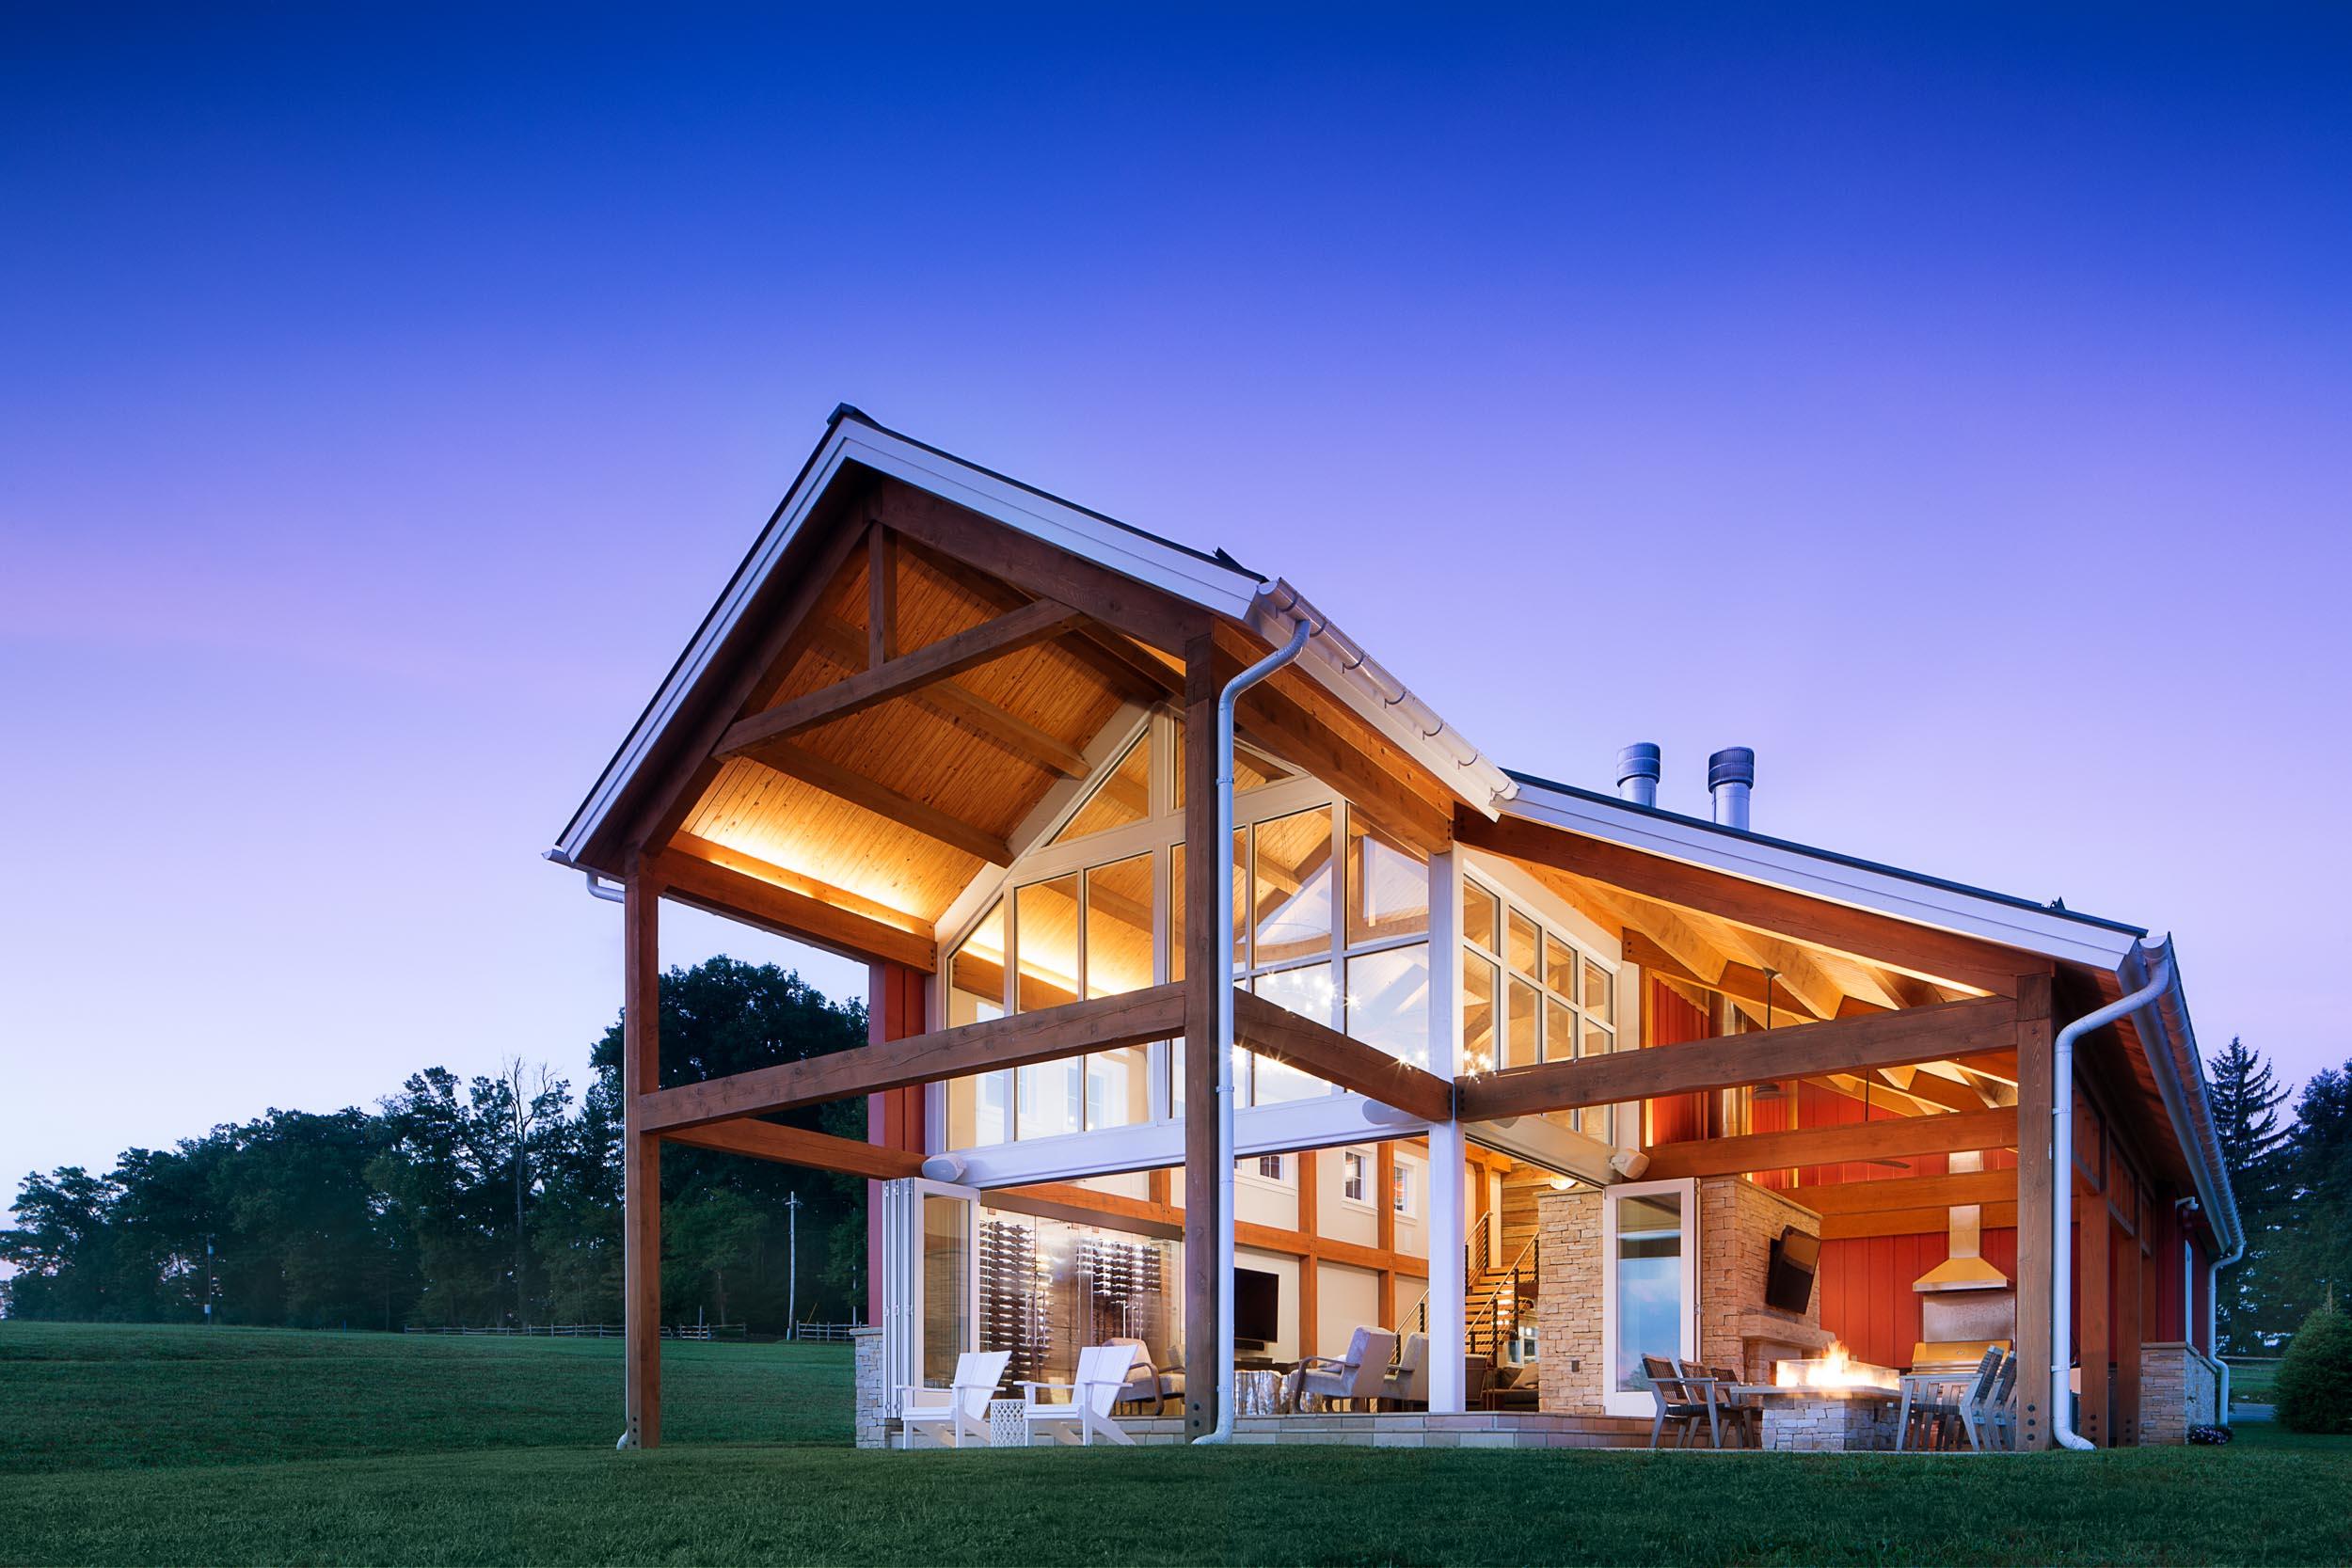 home_barn_upscale_country_grealish-5.jpg